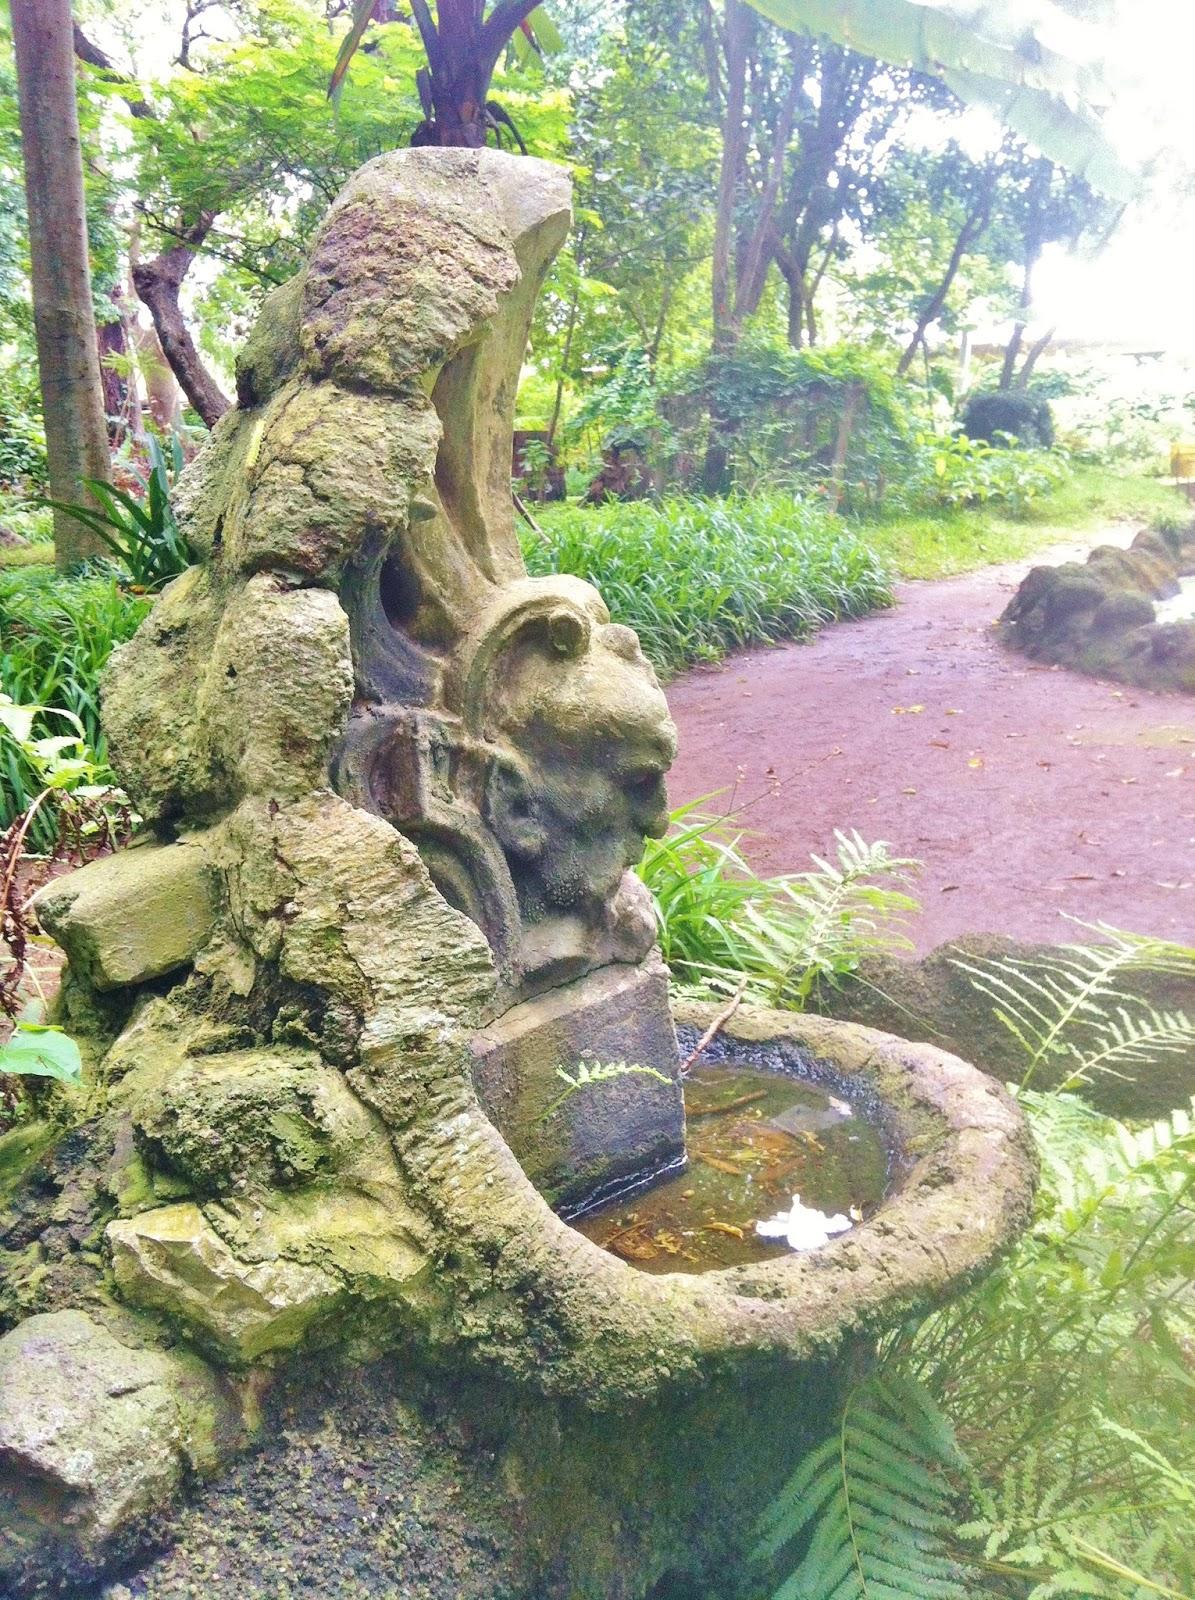 Arlequinblog una visita al jard n bot nico for Como ir al jardin botanico